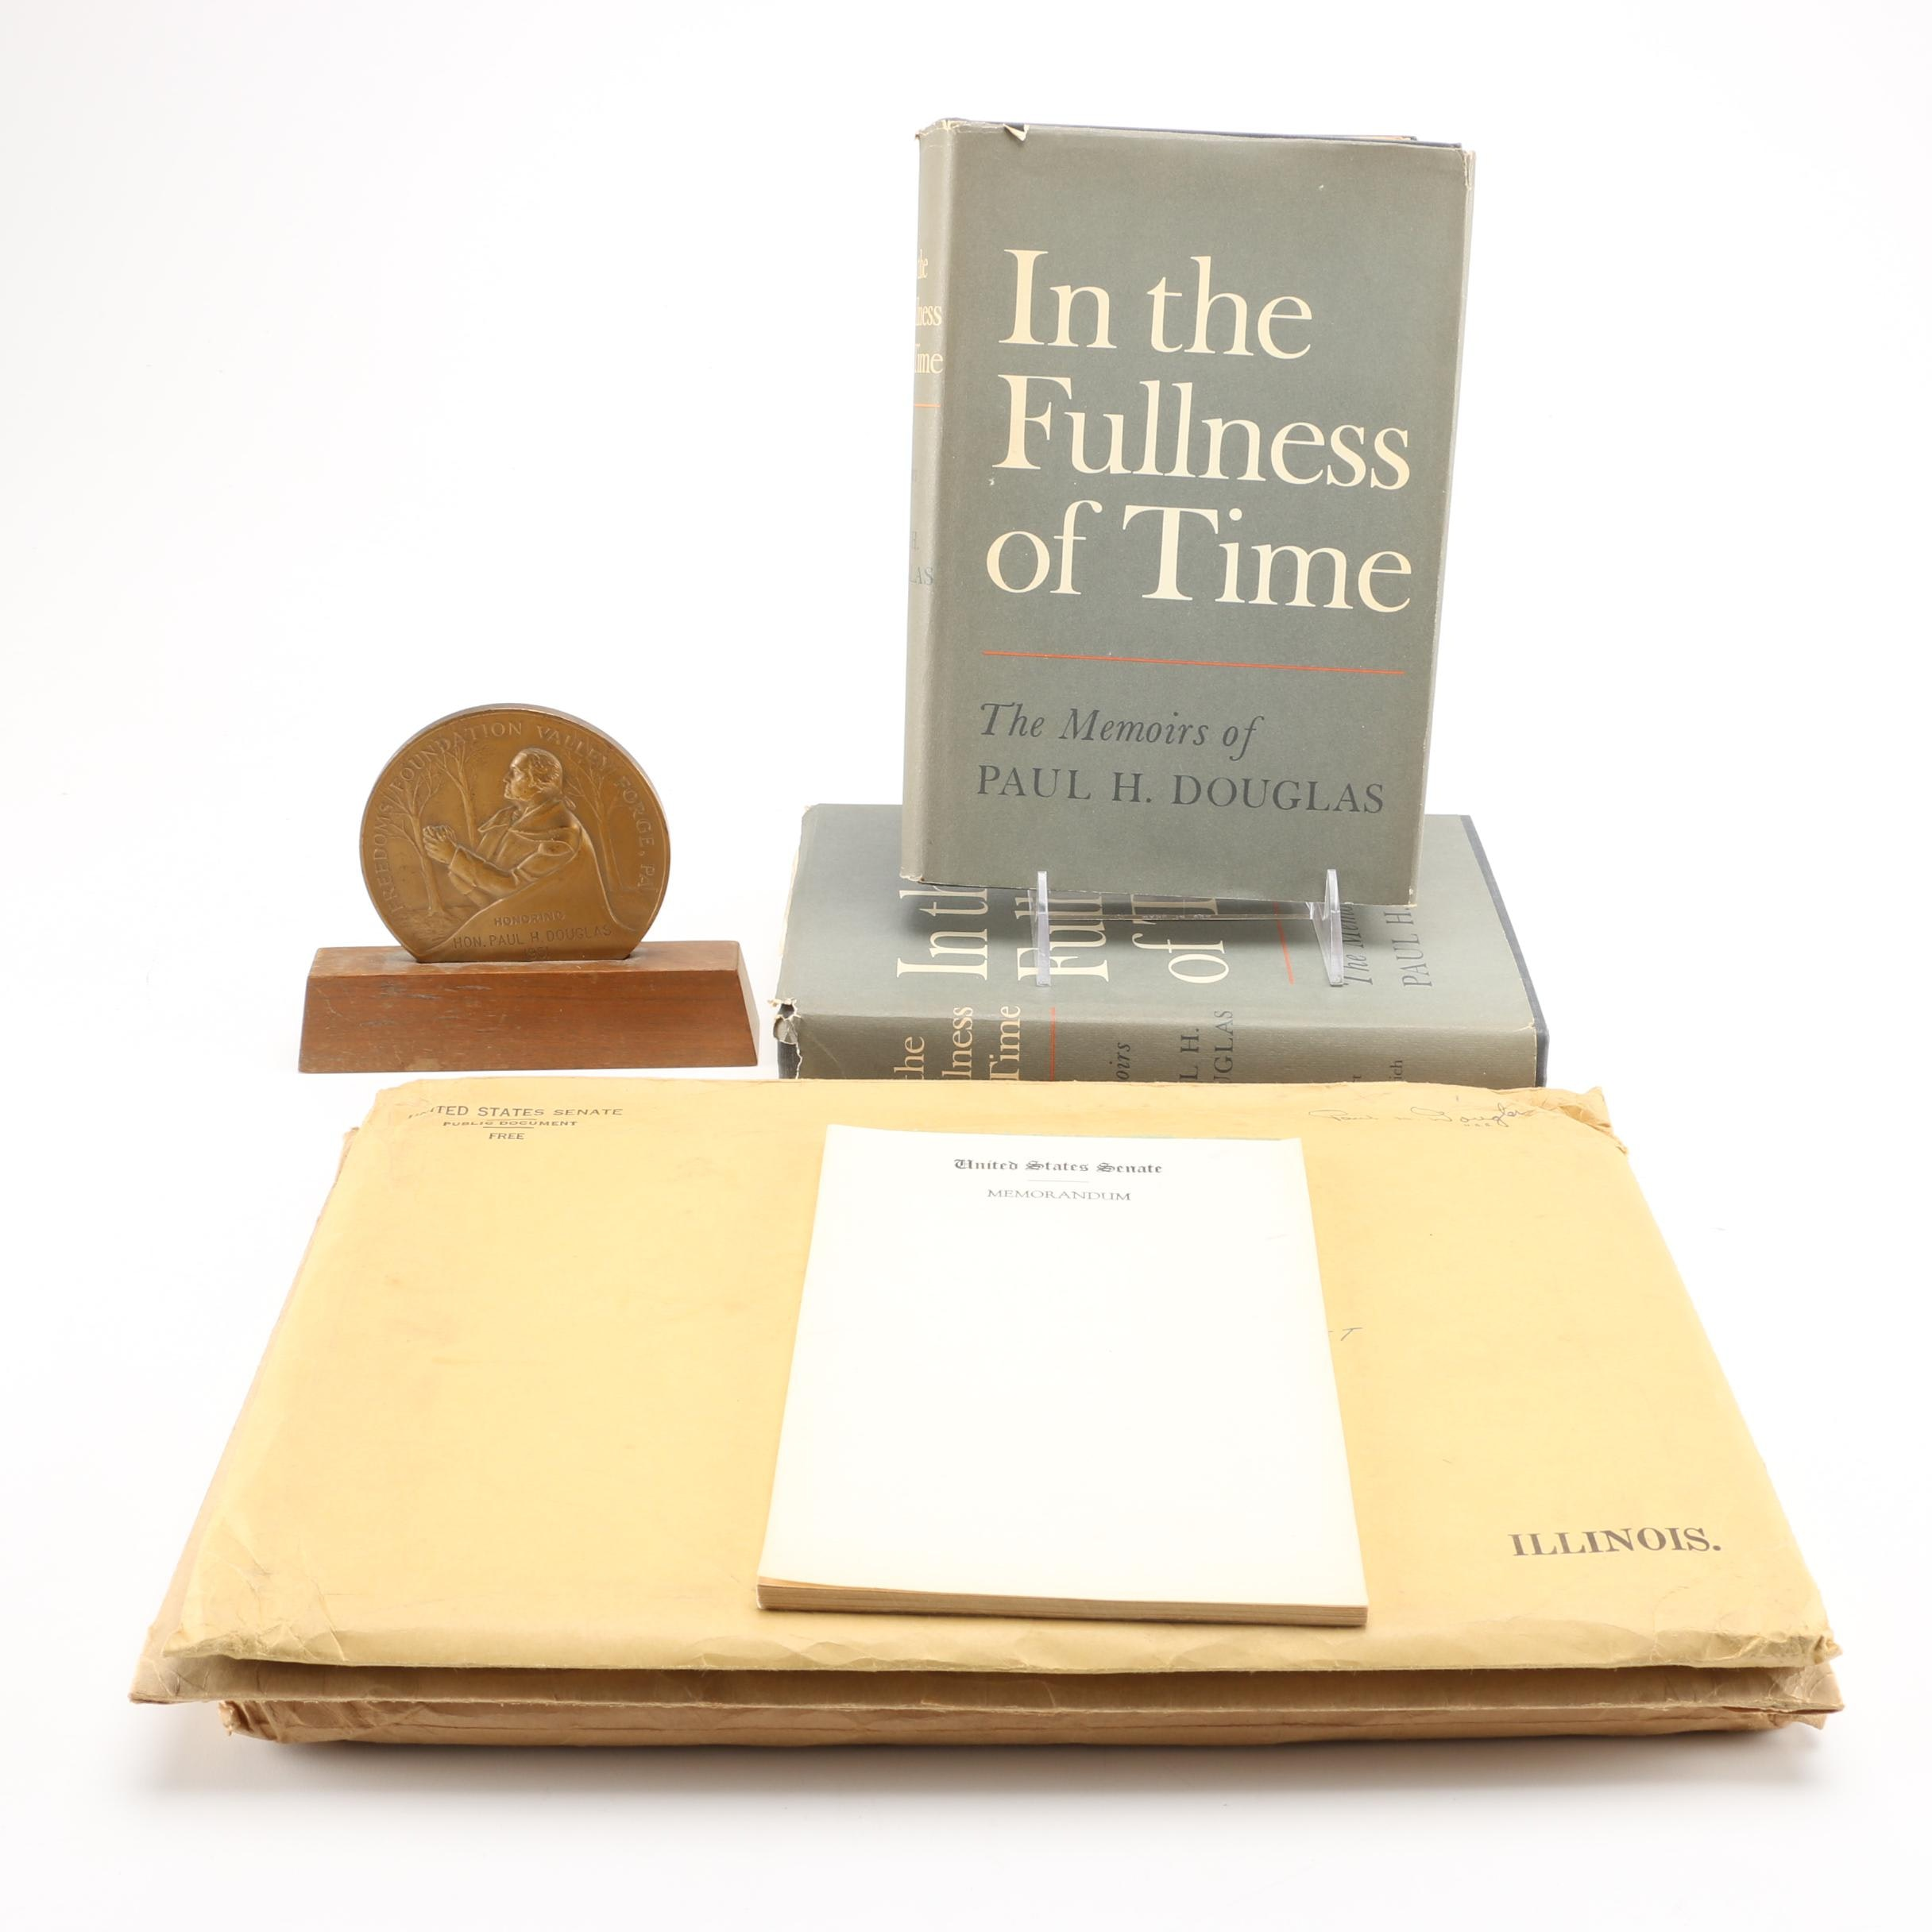 Original Speeches From Senator Paul Douglas and Printed Memoirs